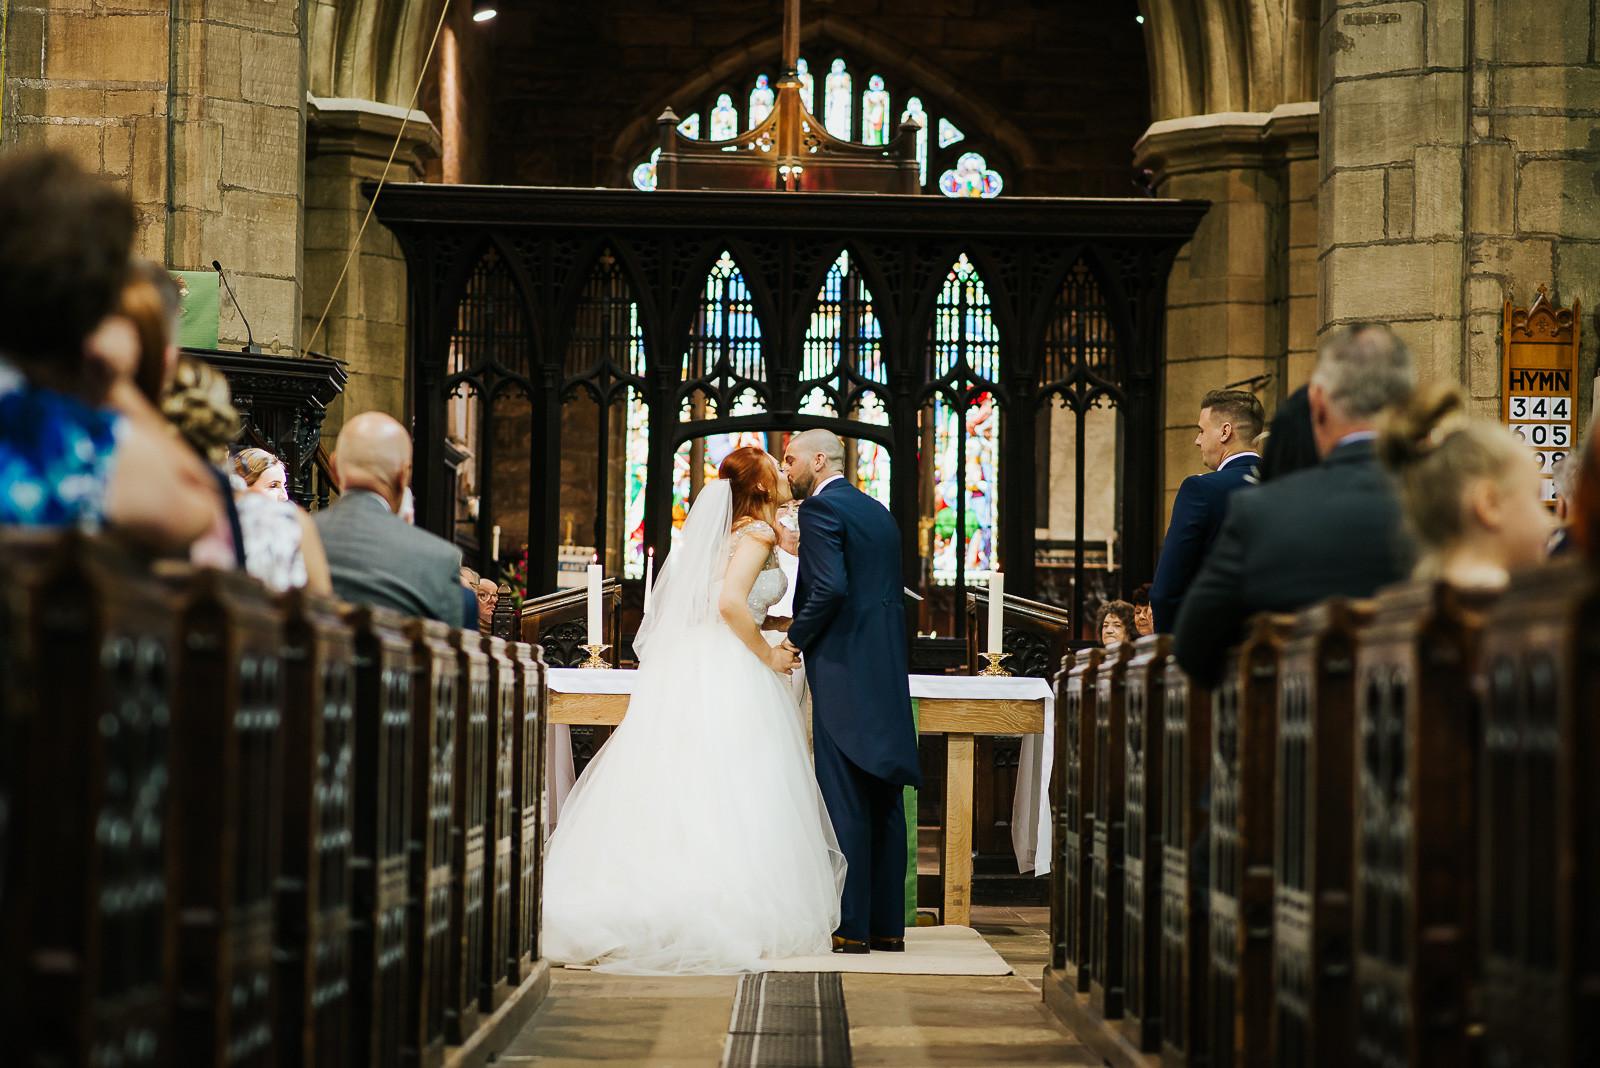 wedding-photography | Fullscreen Page